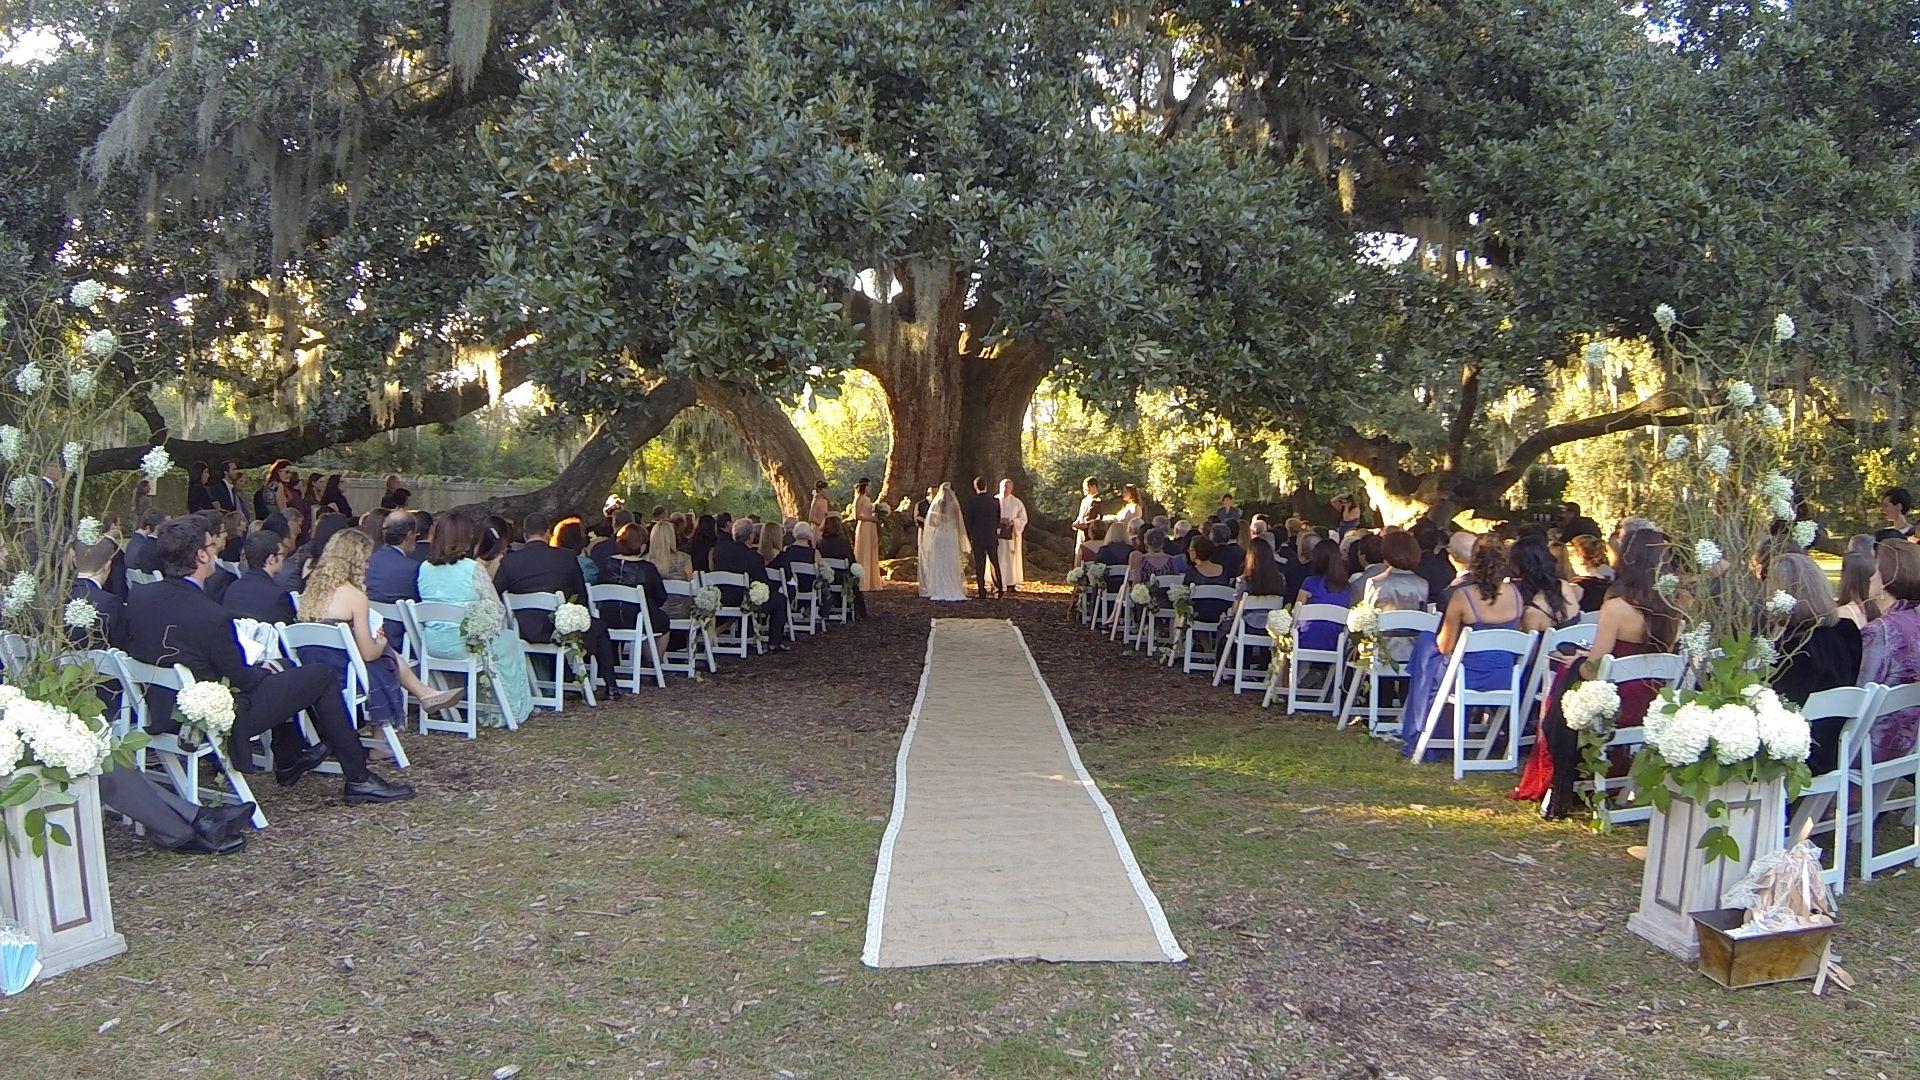 Outdoor Wedding @ The Tree Of Life, Audubon Park, New